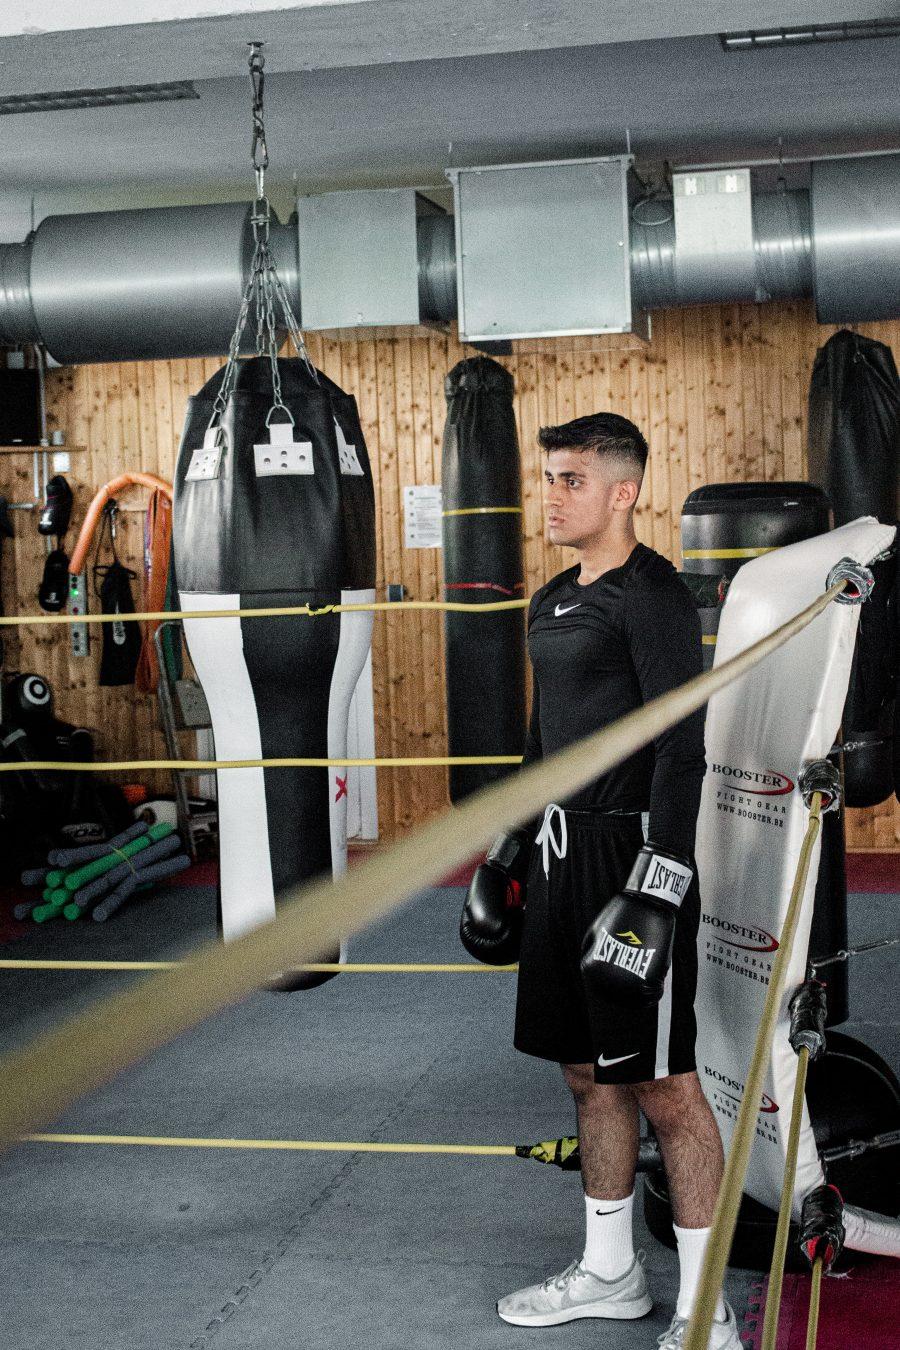 boks training vetverbranding afvallen